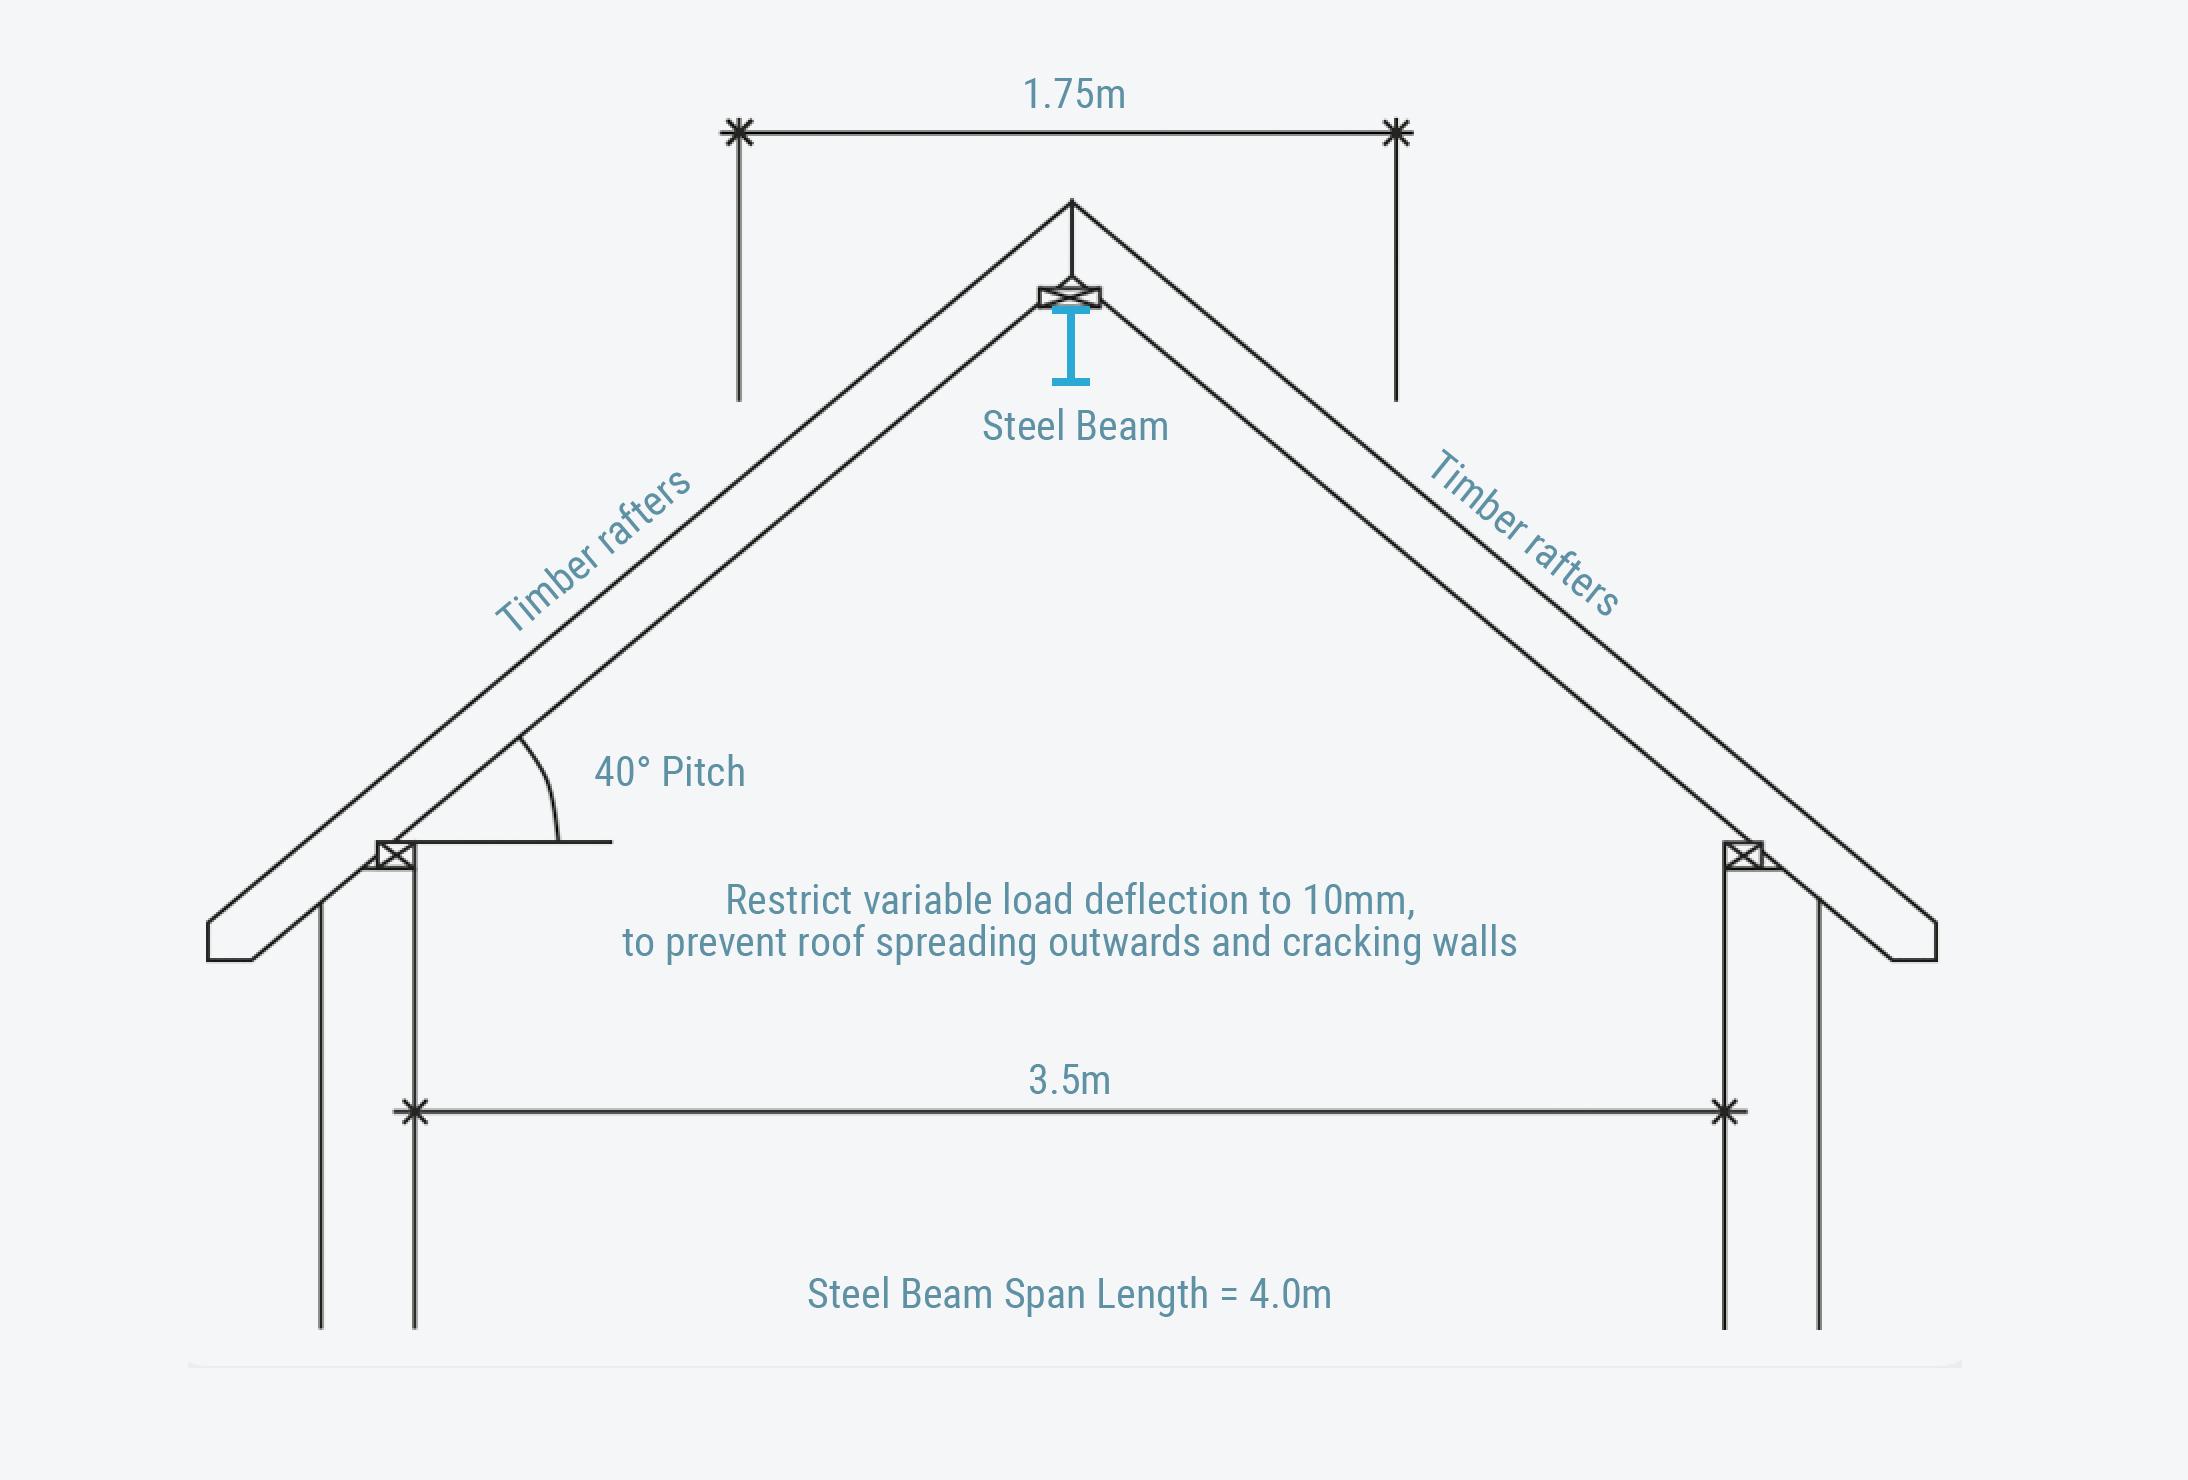 Lintel Design Spreadsheet Payment Spreadshee steel angle